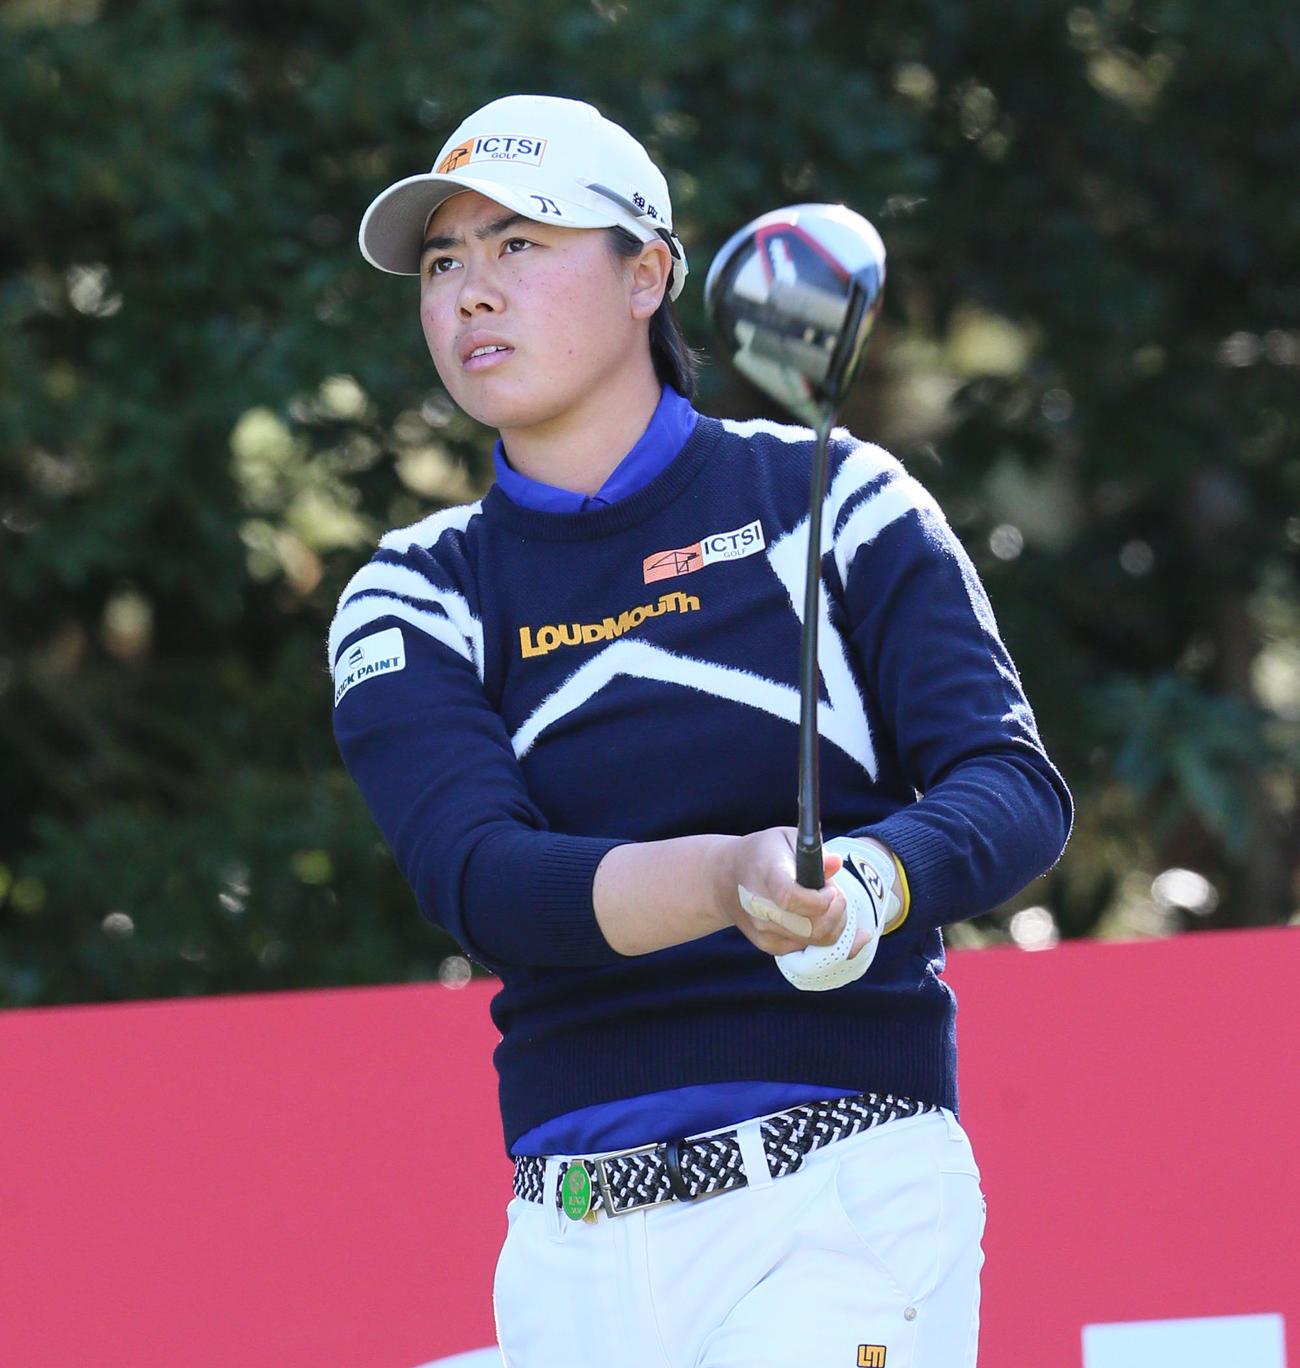 https://www.nikkansports.com/sports/golf/news/img/202011290000071-w1300_2.jpg